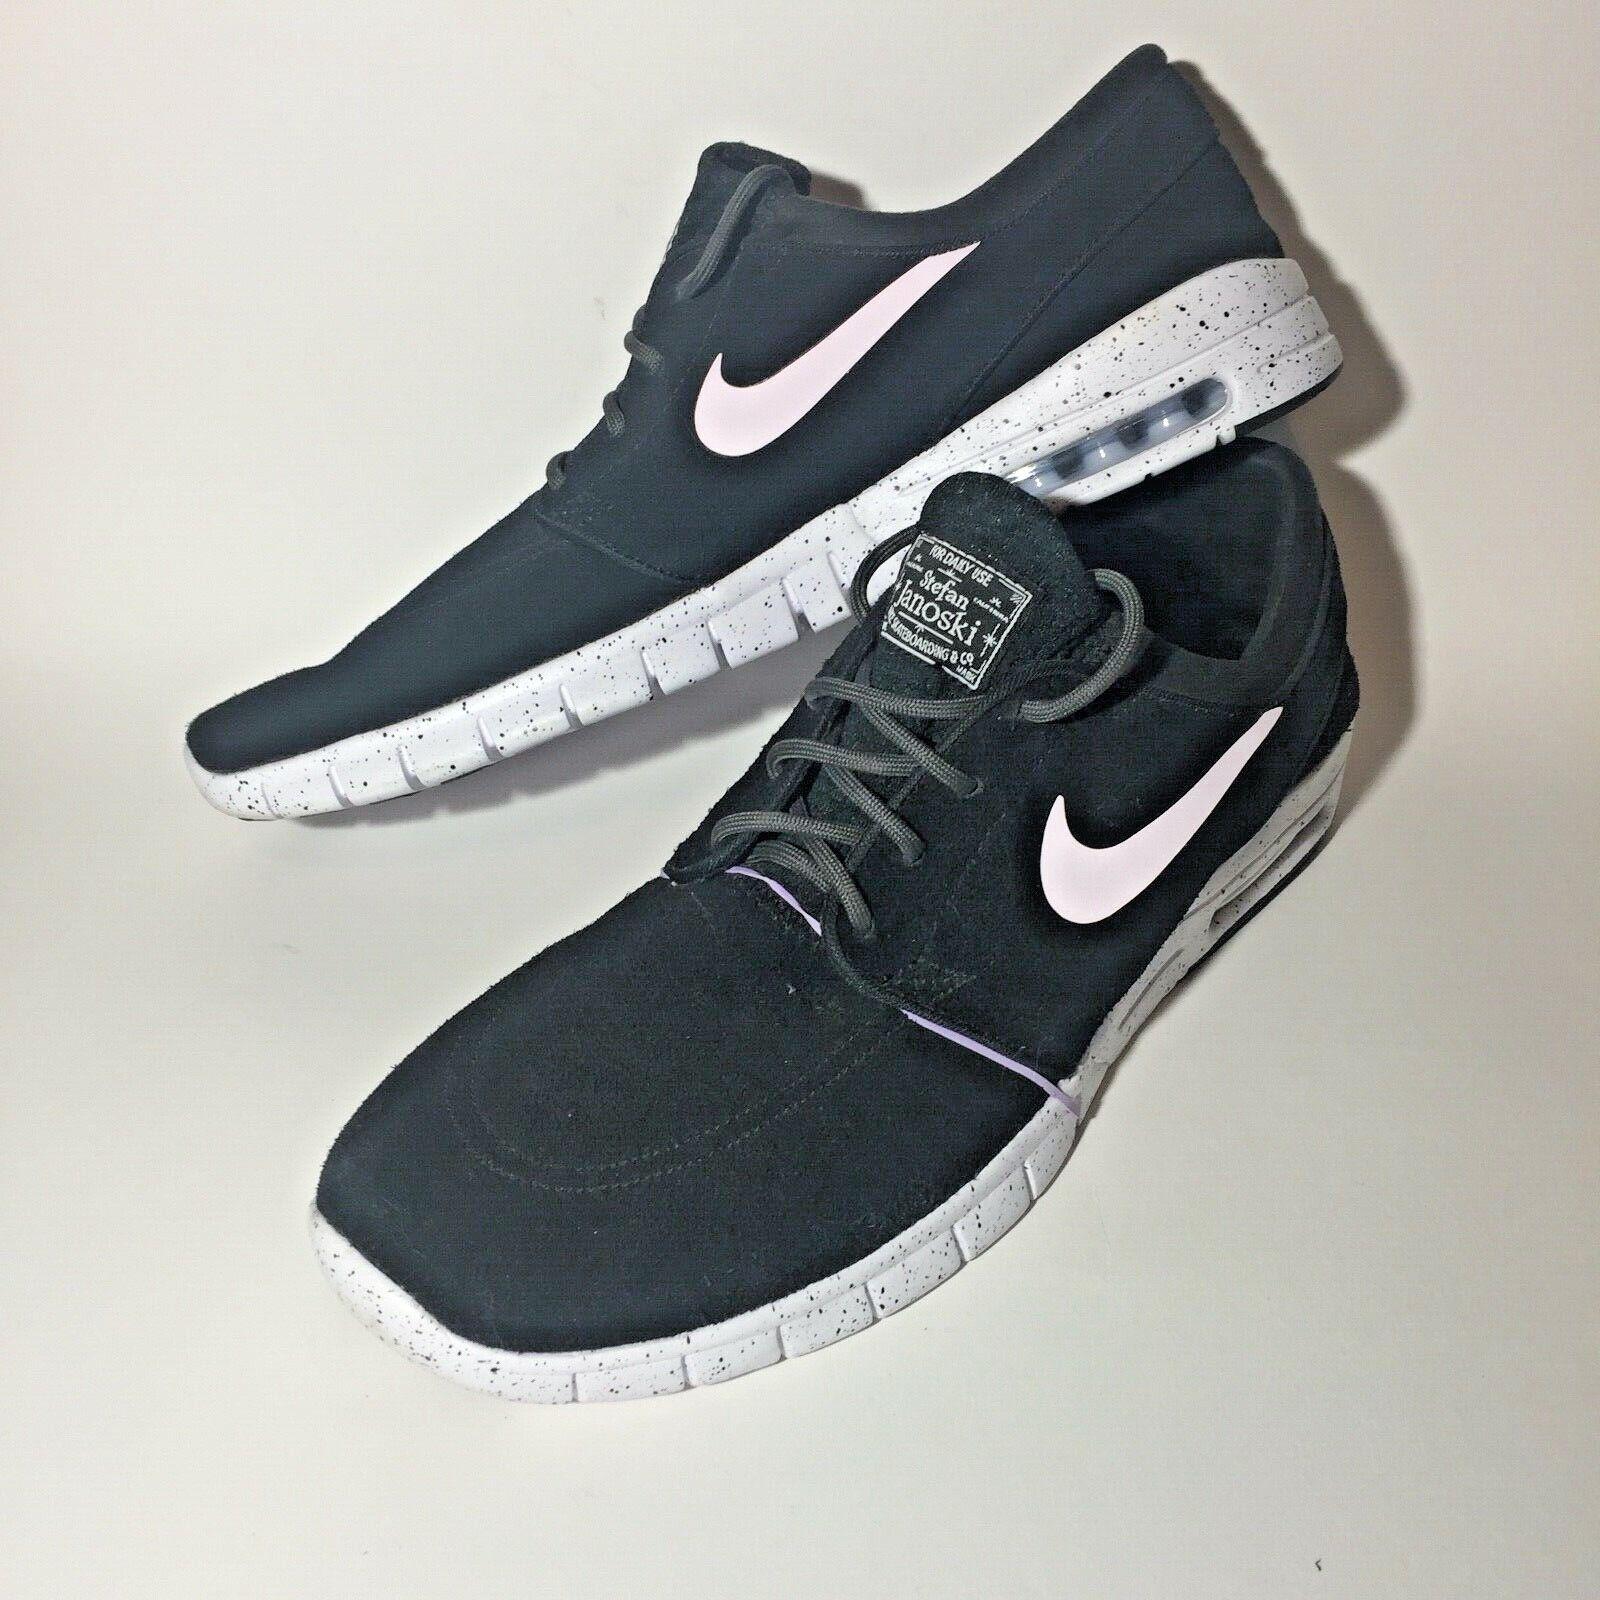 Escritura fingir Párrafo  Nike Stefan Janoski Max L 685299-039 Mens Shoes Trainers EUR 44.5 for sale    eBay